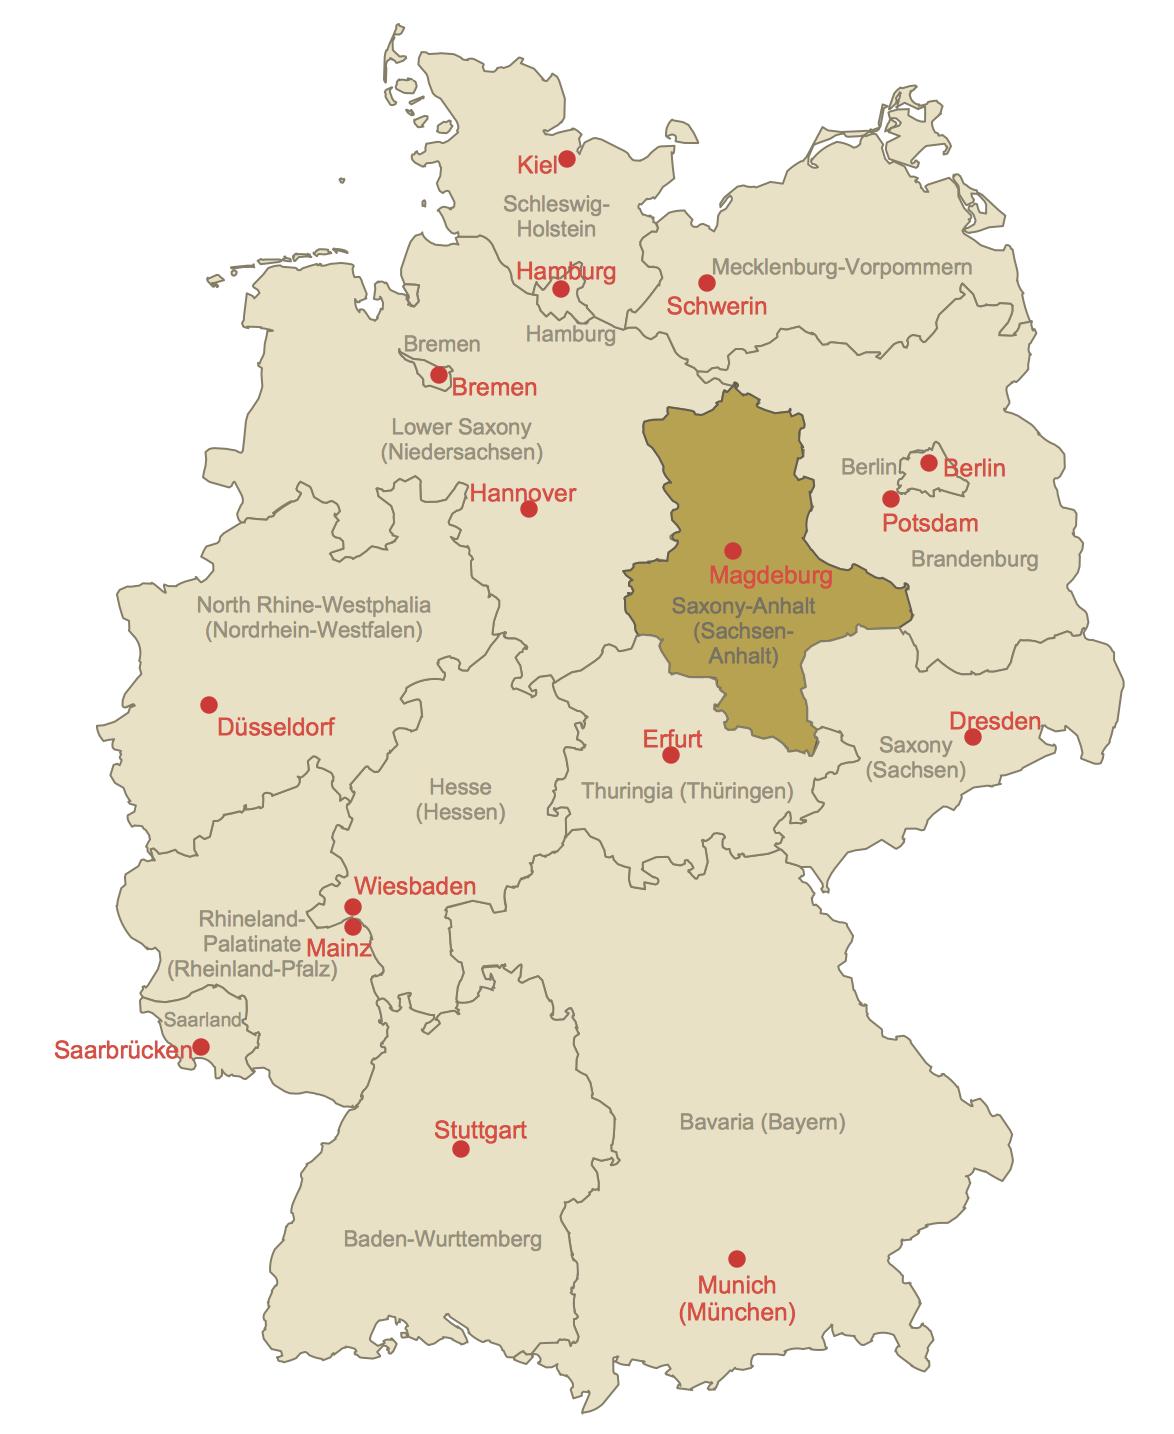 Locator Map of Saxony-Anhalt